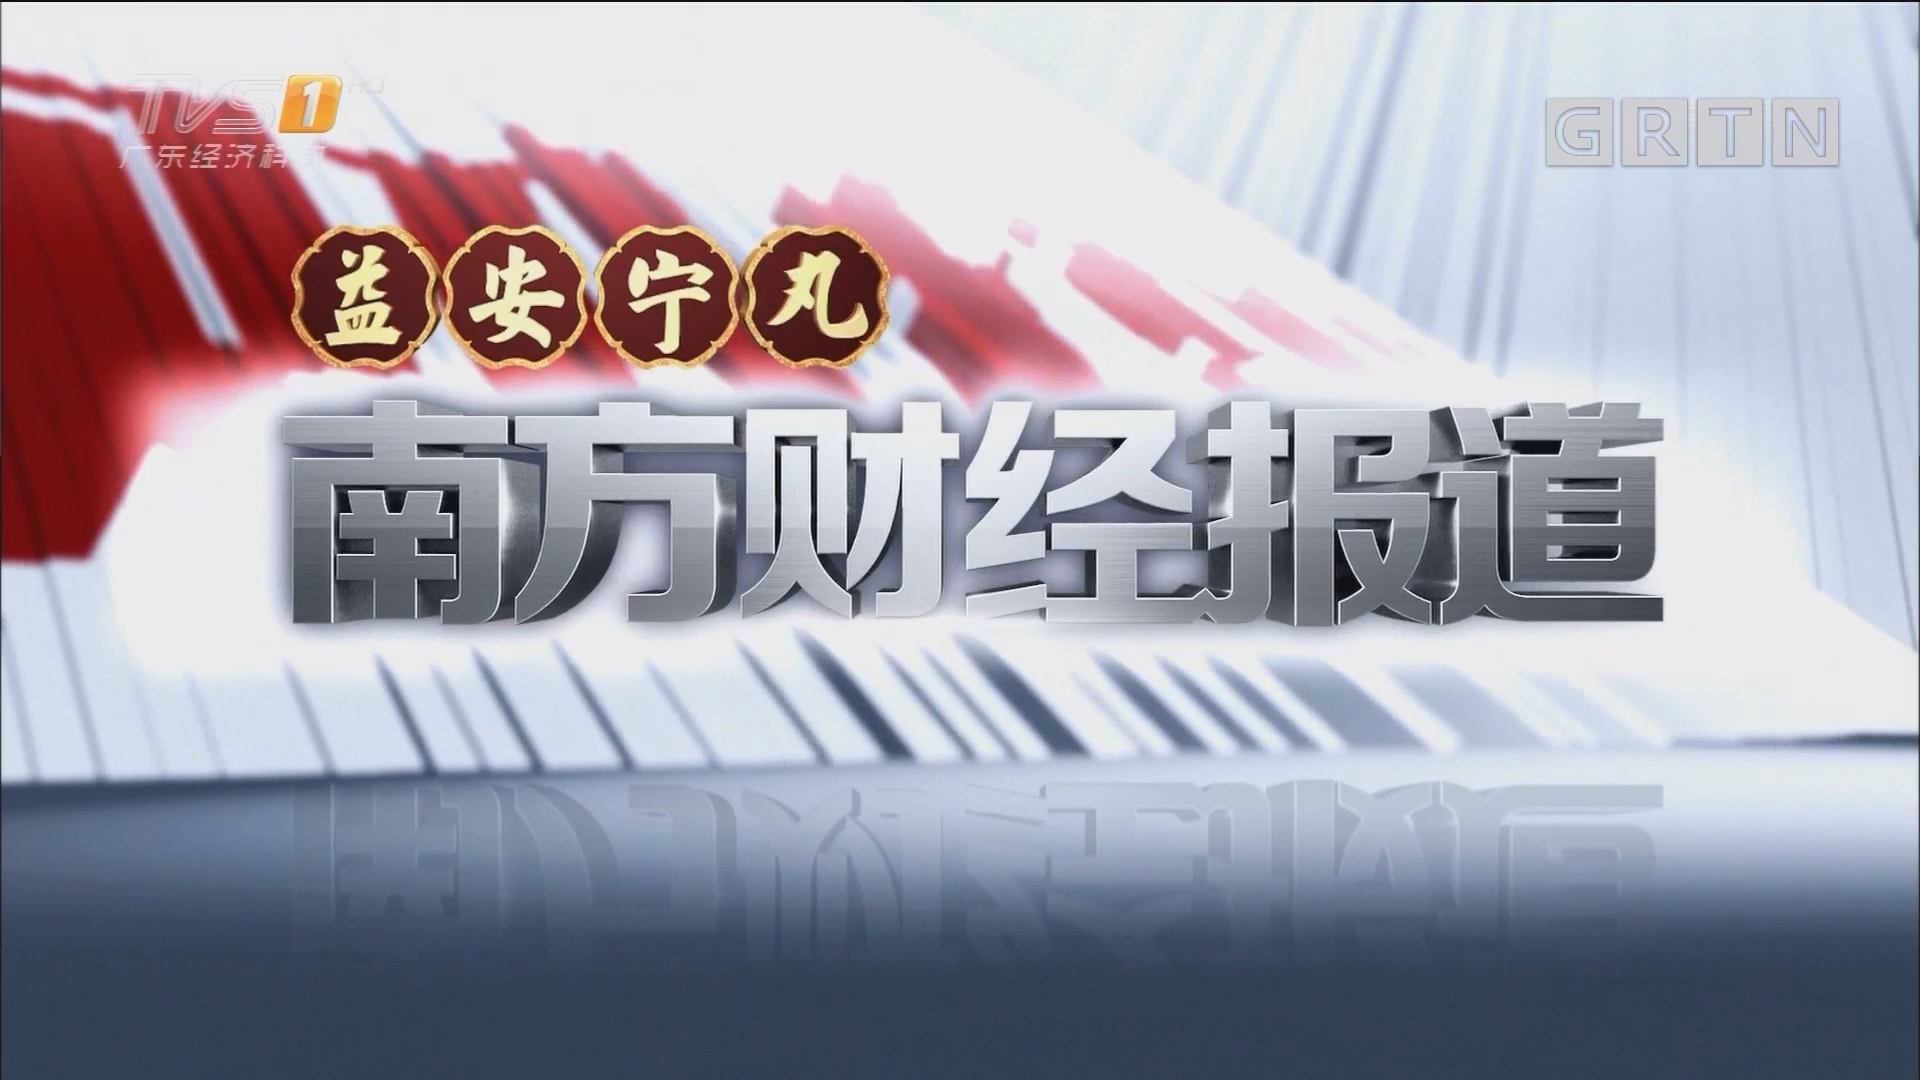 [HD][2018-05-18]南方财经报道:中国(广东)——美国投资合作交流会在广州举行:马兴瑞出席并发表主旨演讲